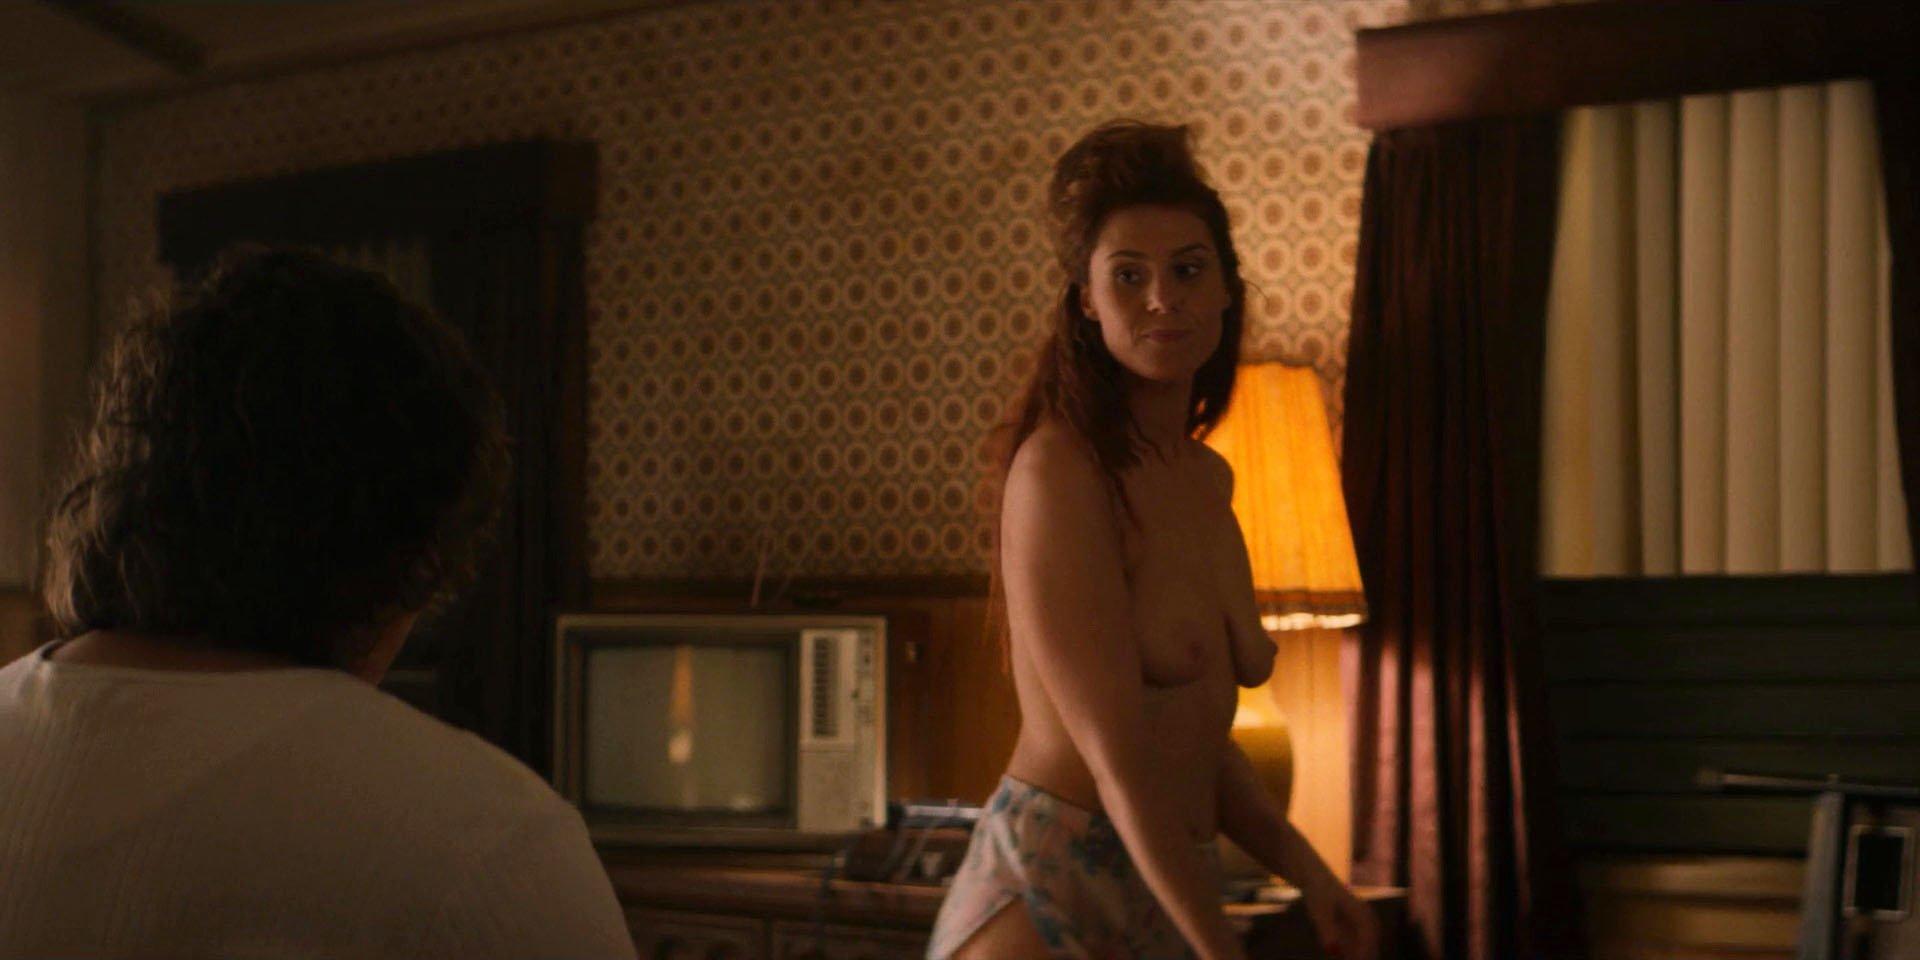 clip free movie nude Actress